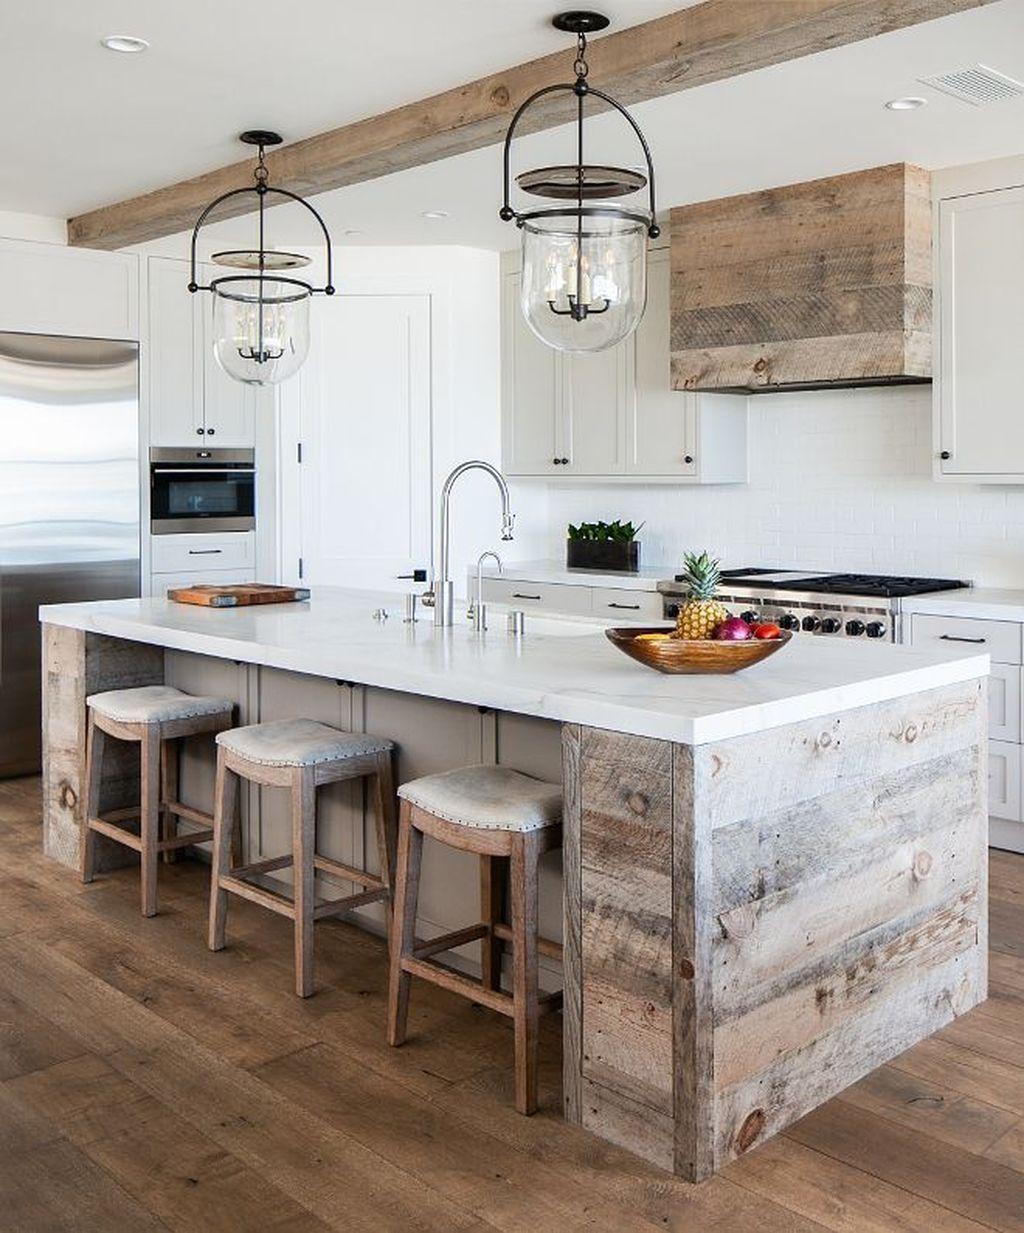 29 beautiful beach style kitchen ideas for your beach house or villa wood kitchen island on kitchen ideas with island id=77223